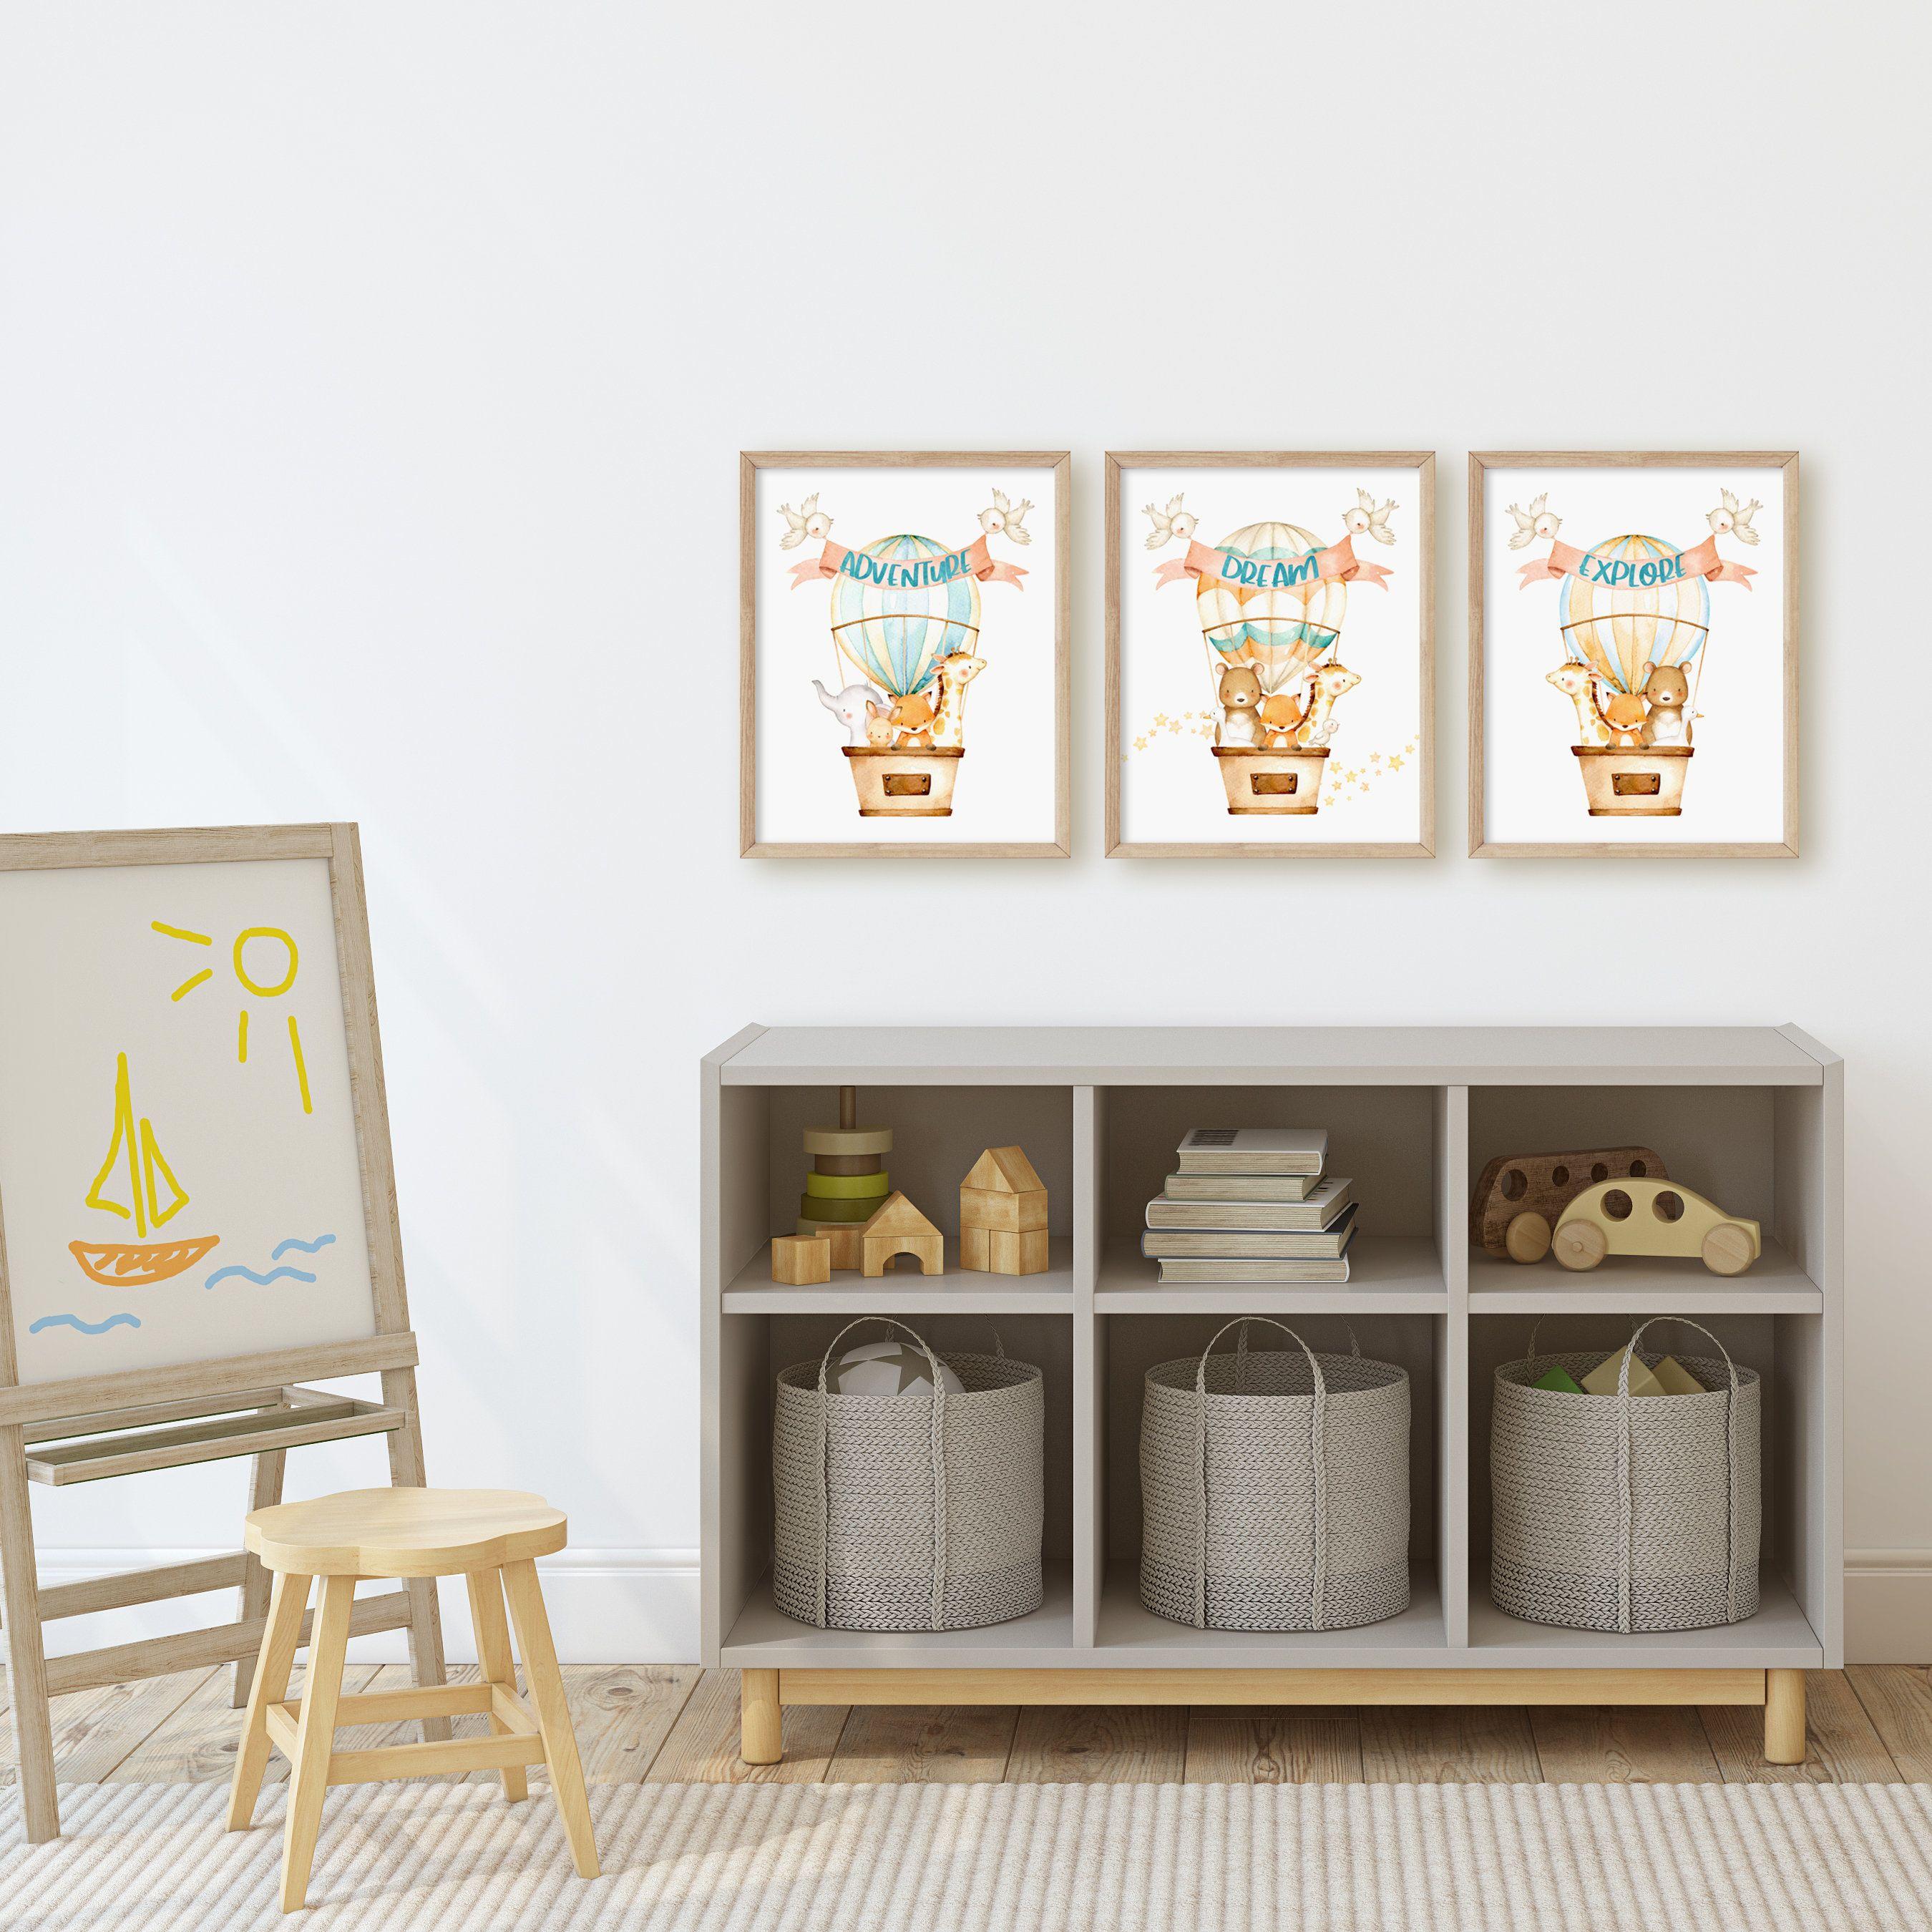 Hot Air Balloon Nursery Decor Printable Wall Art Etsy in